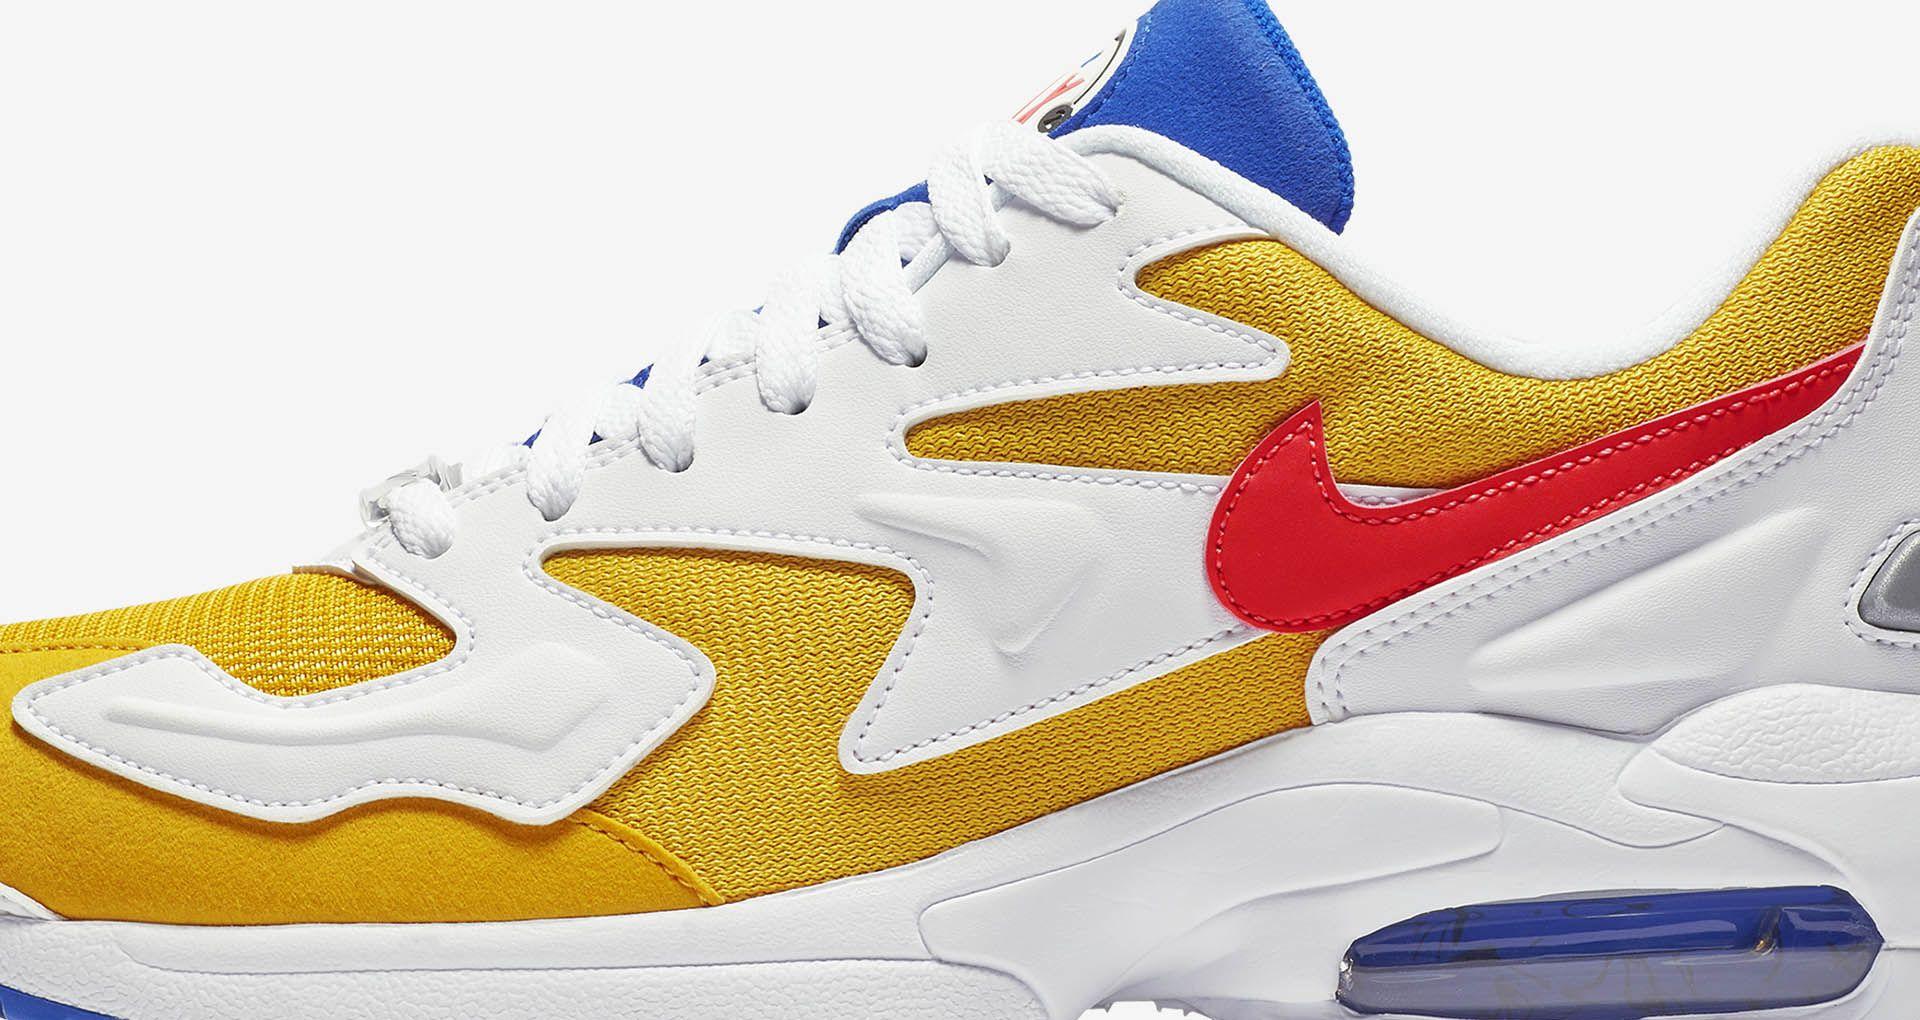 Nike Air Max2 Light 'University Gold & Racer Blue &